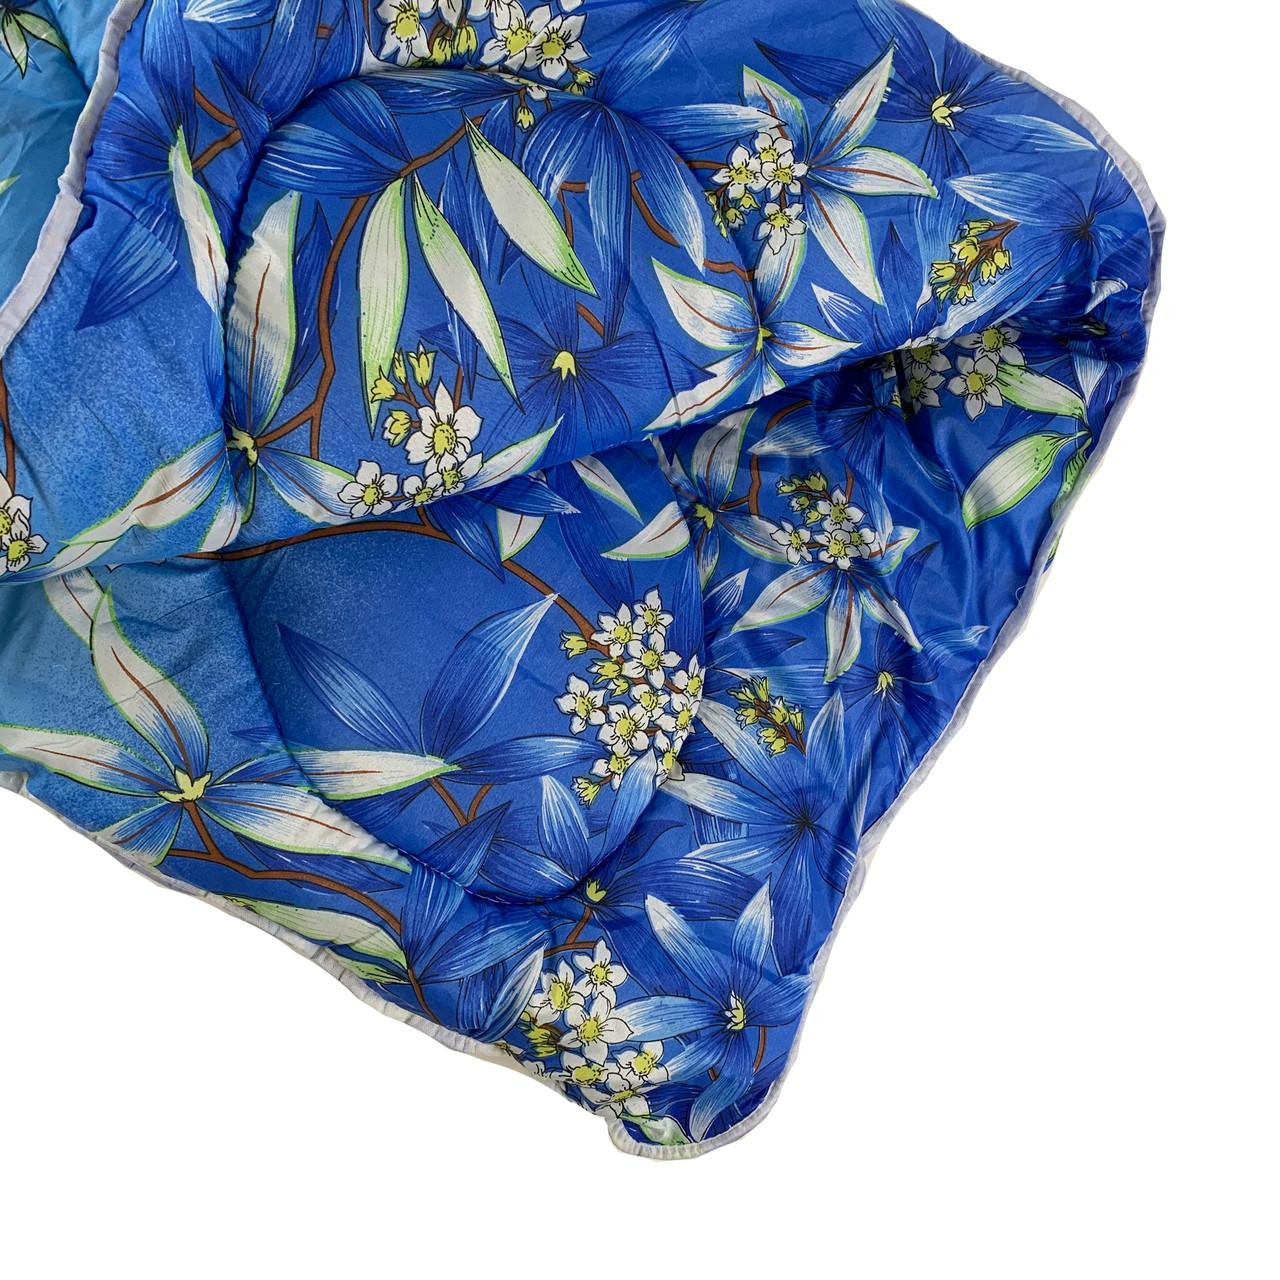 Одеяло двуспальное холлофайбер 180*220 см, Украина